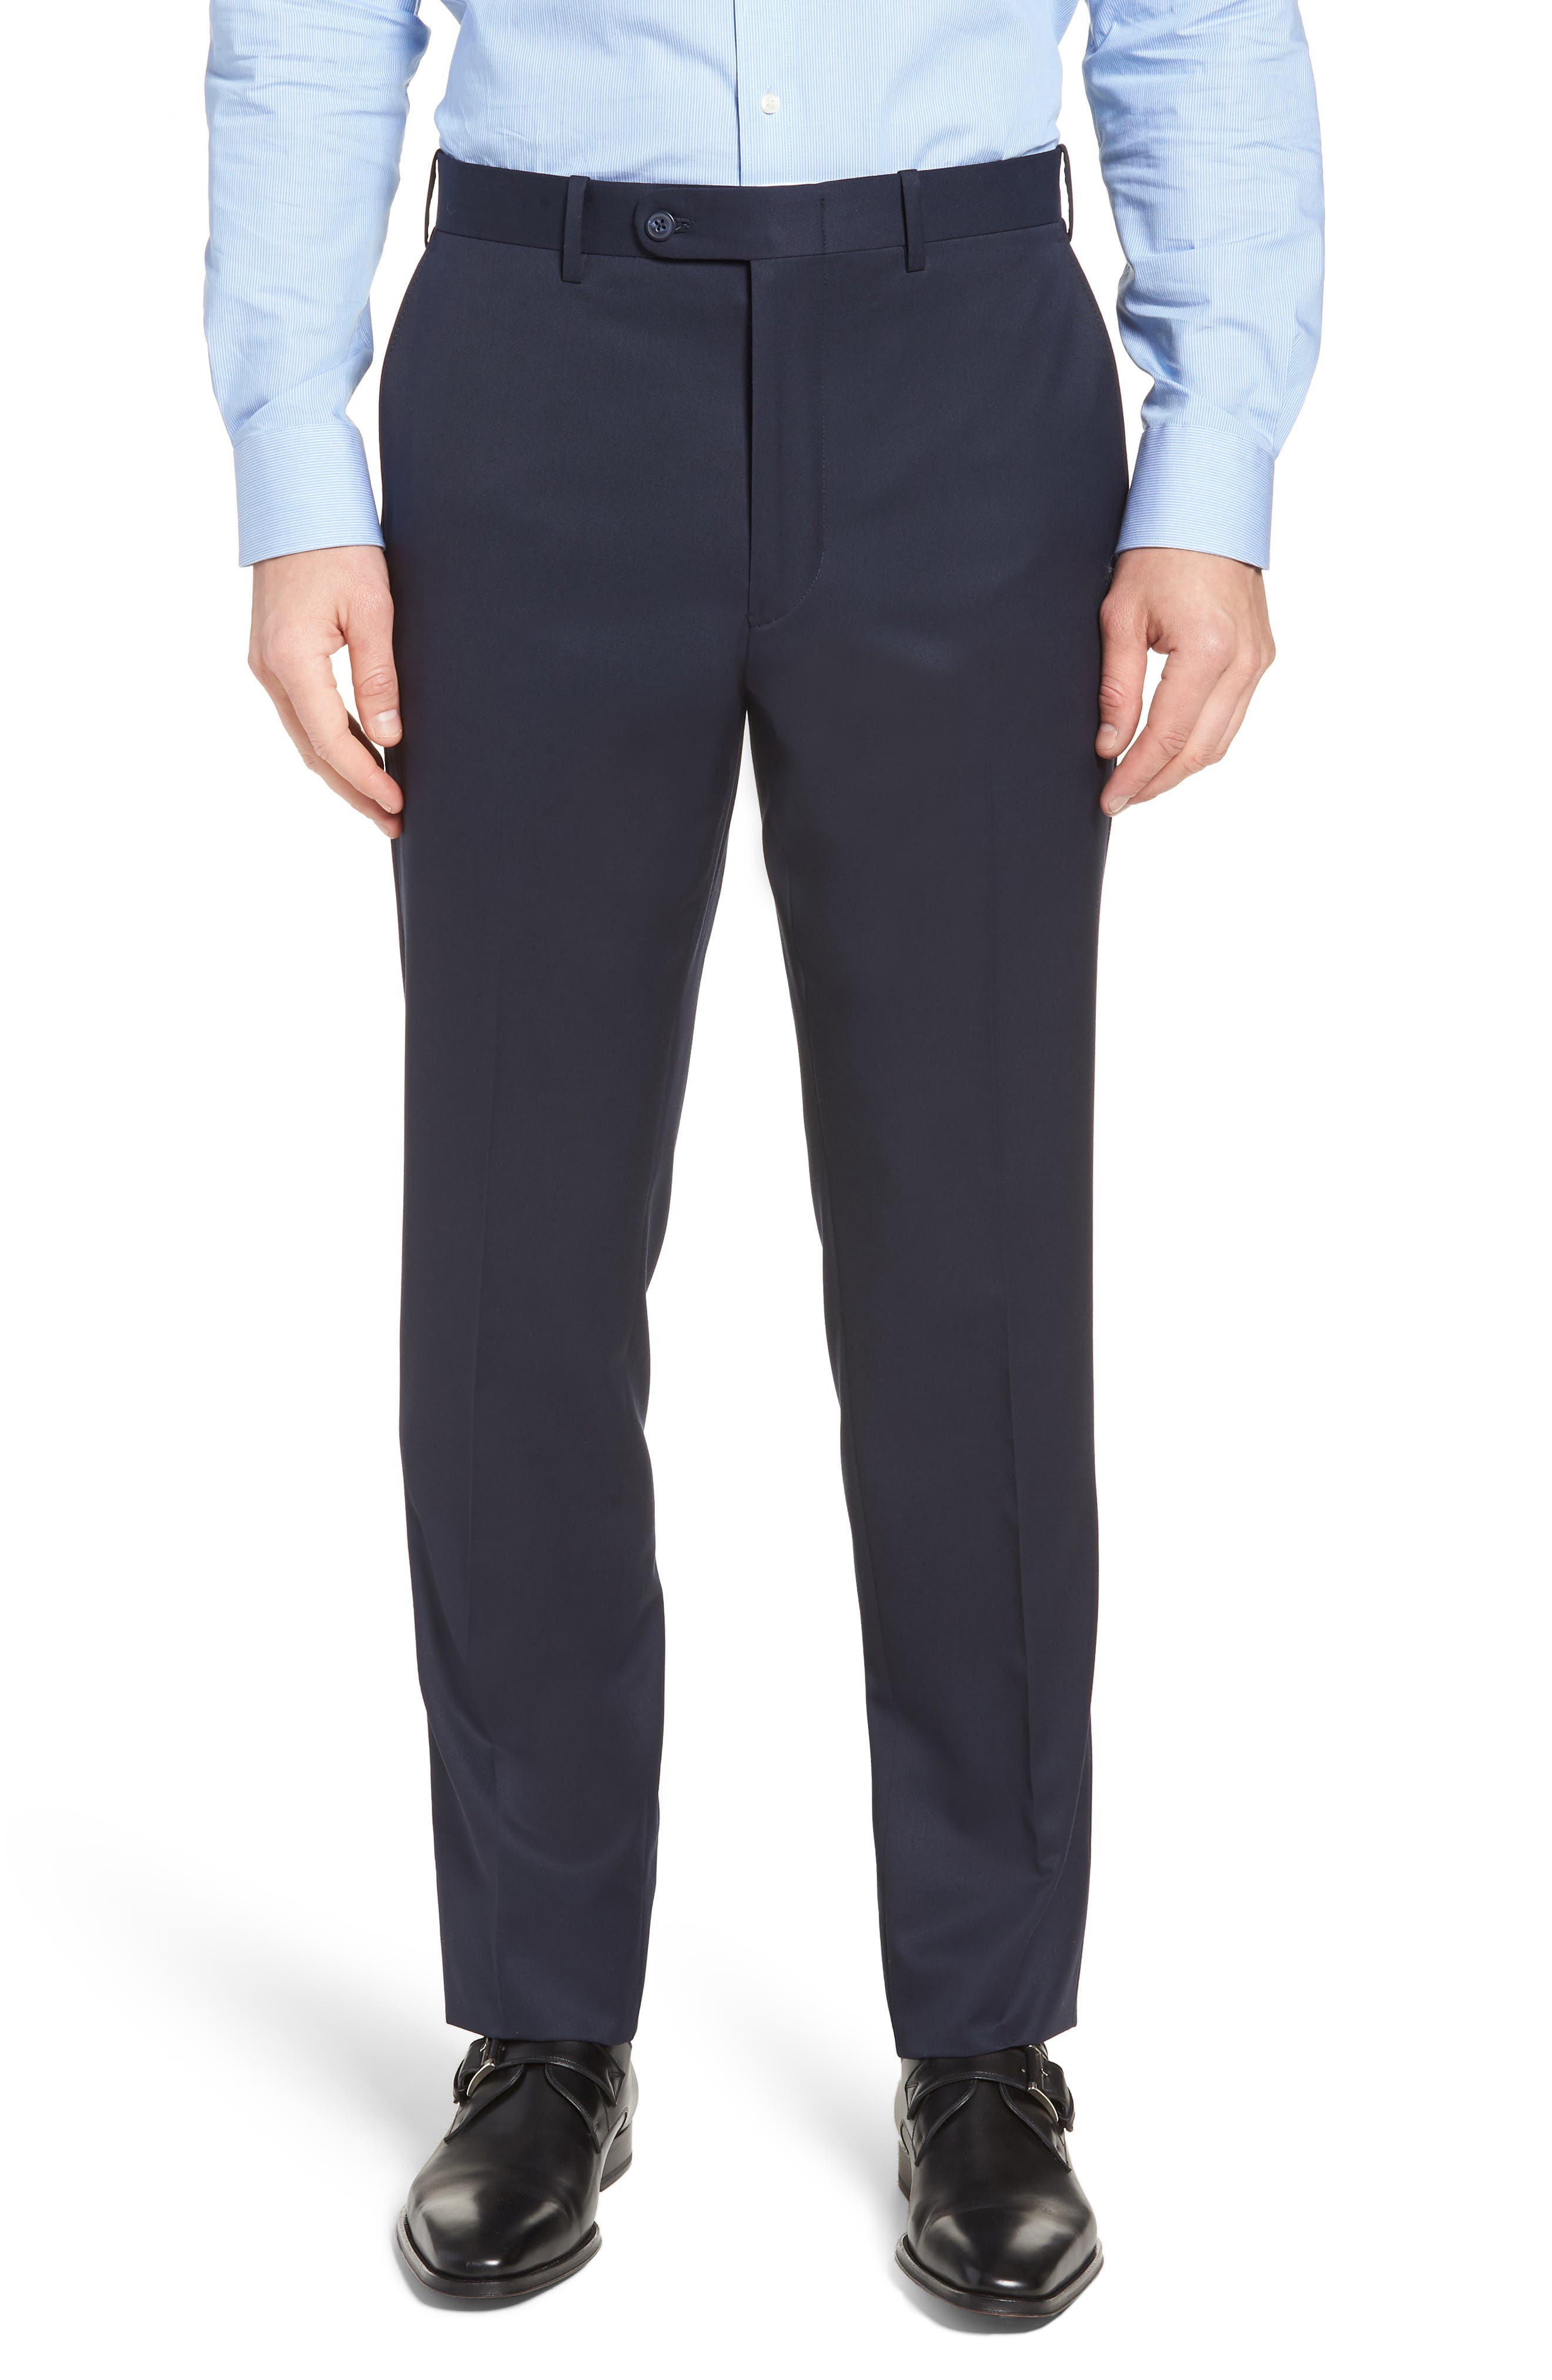 Men's John W. Nordstrom Torino Classic Fit Flat Front Solid Dress Pants